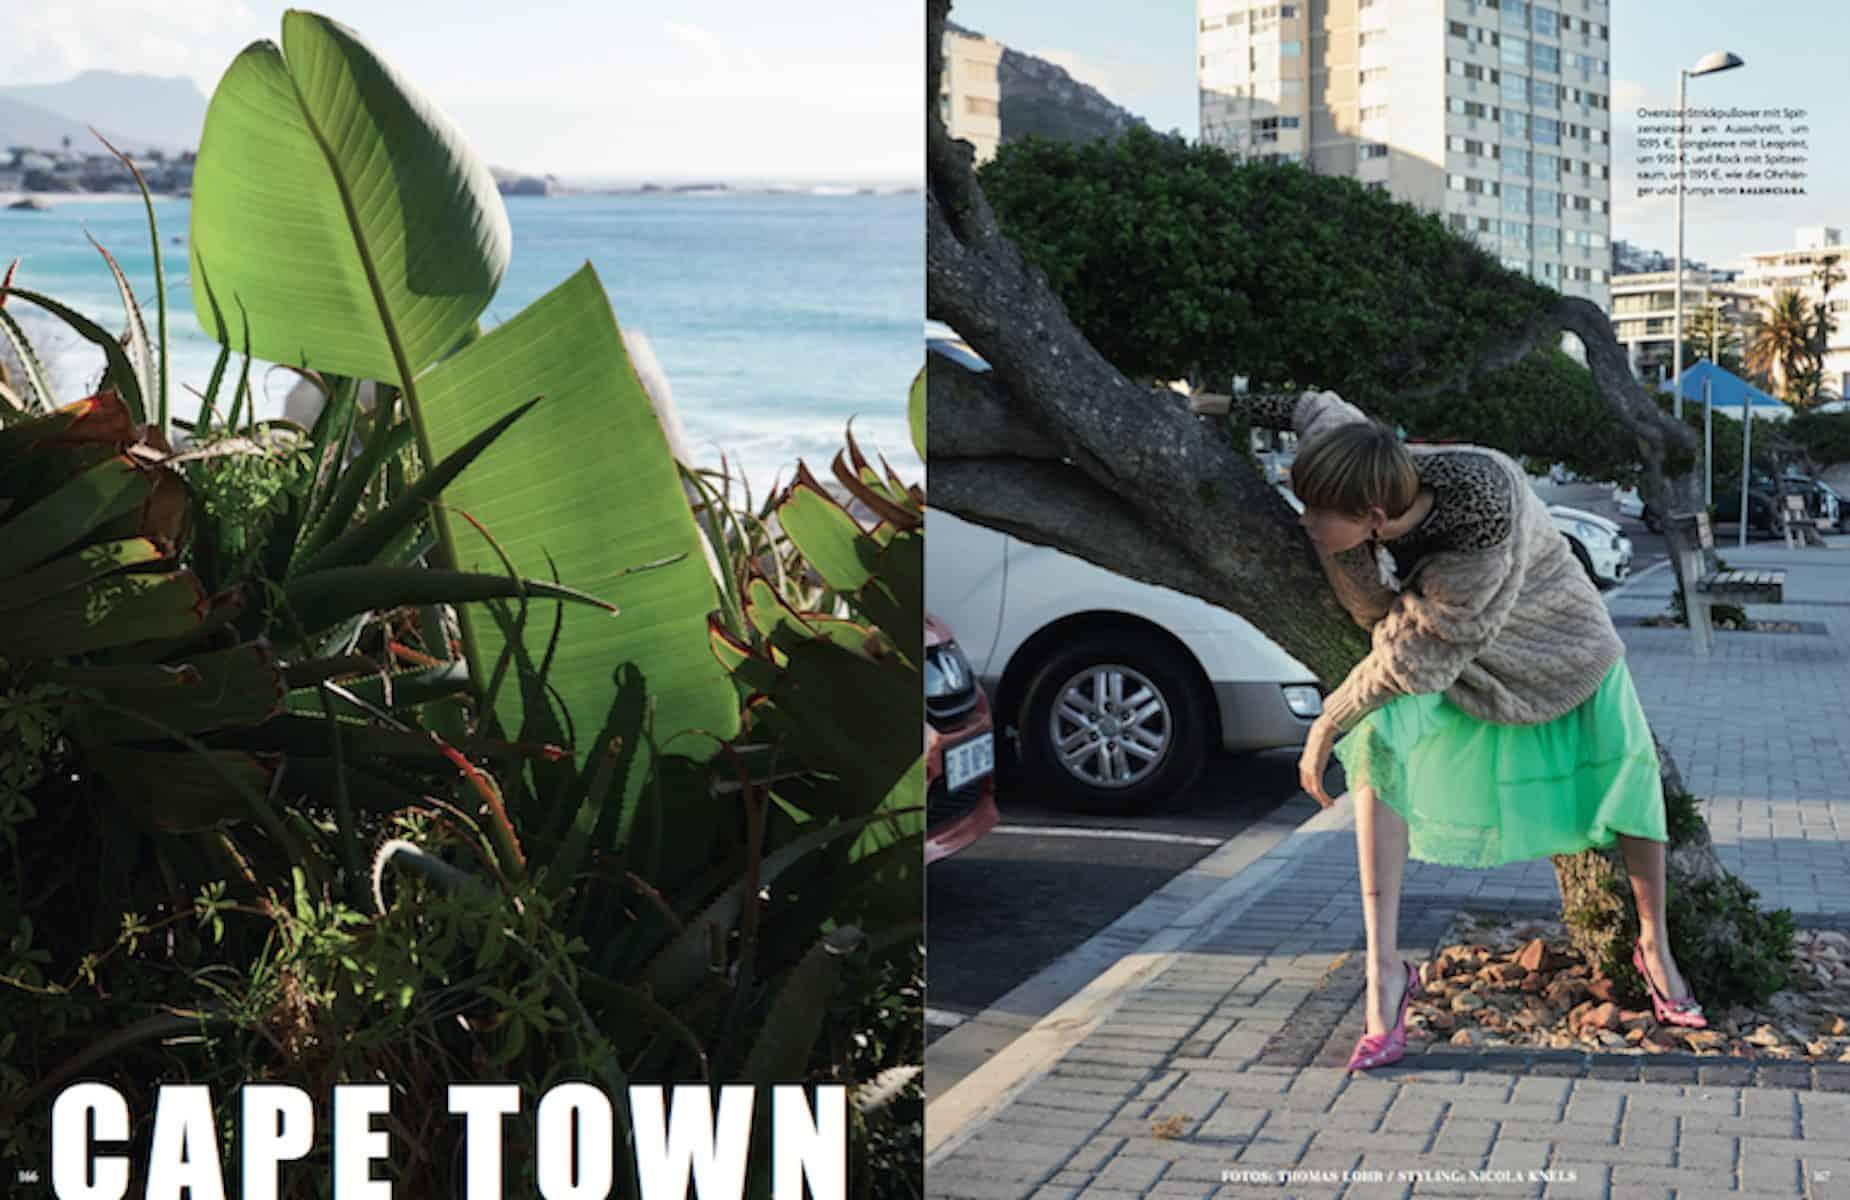 German Vogue – Thomas Lohr – Cape Town - Production by Baker & Co